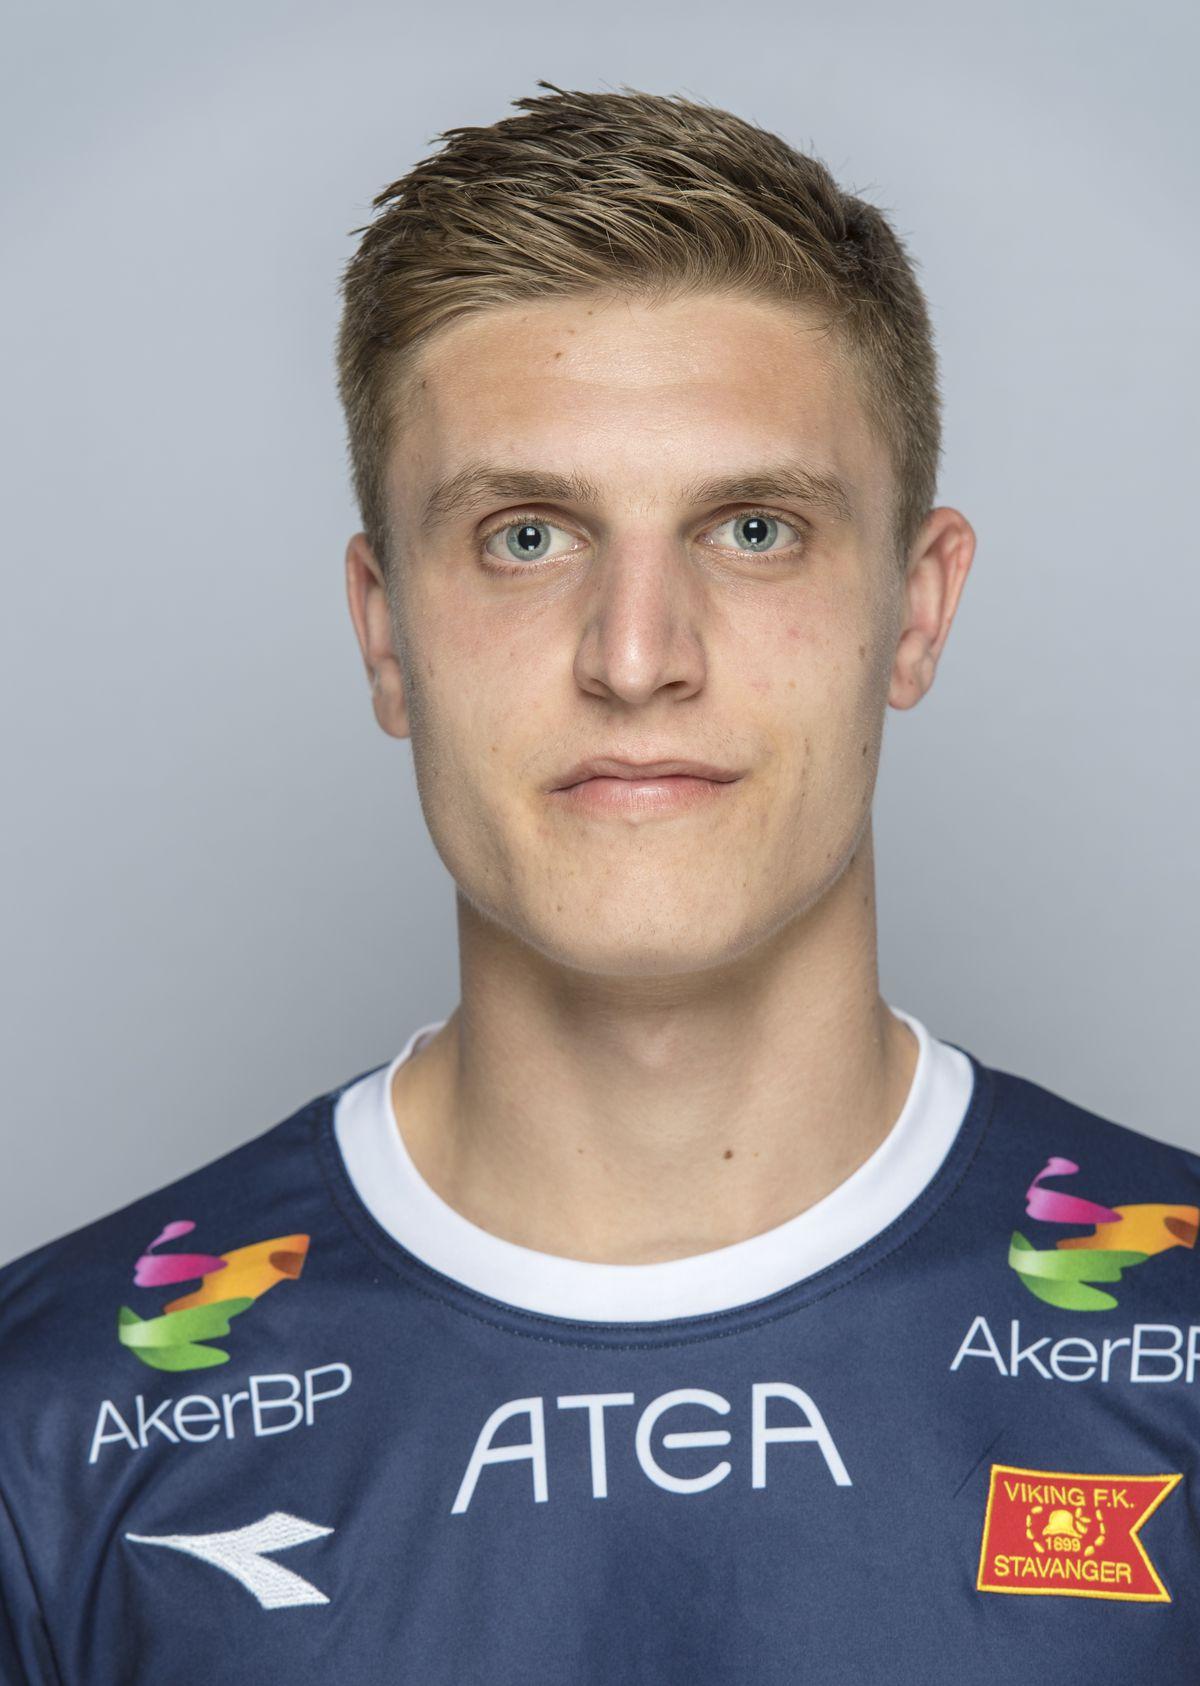 Viking FK Photocall - Elite Serien Norway 2017